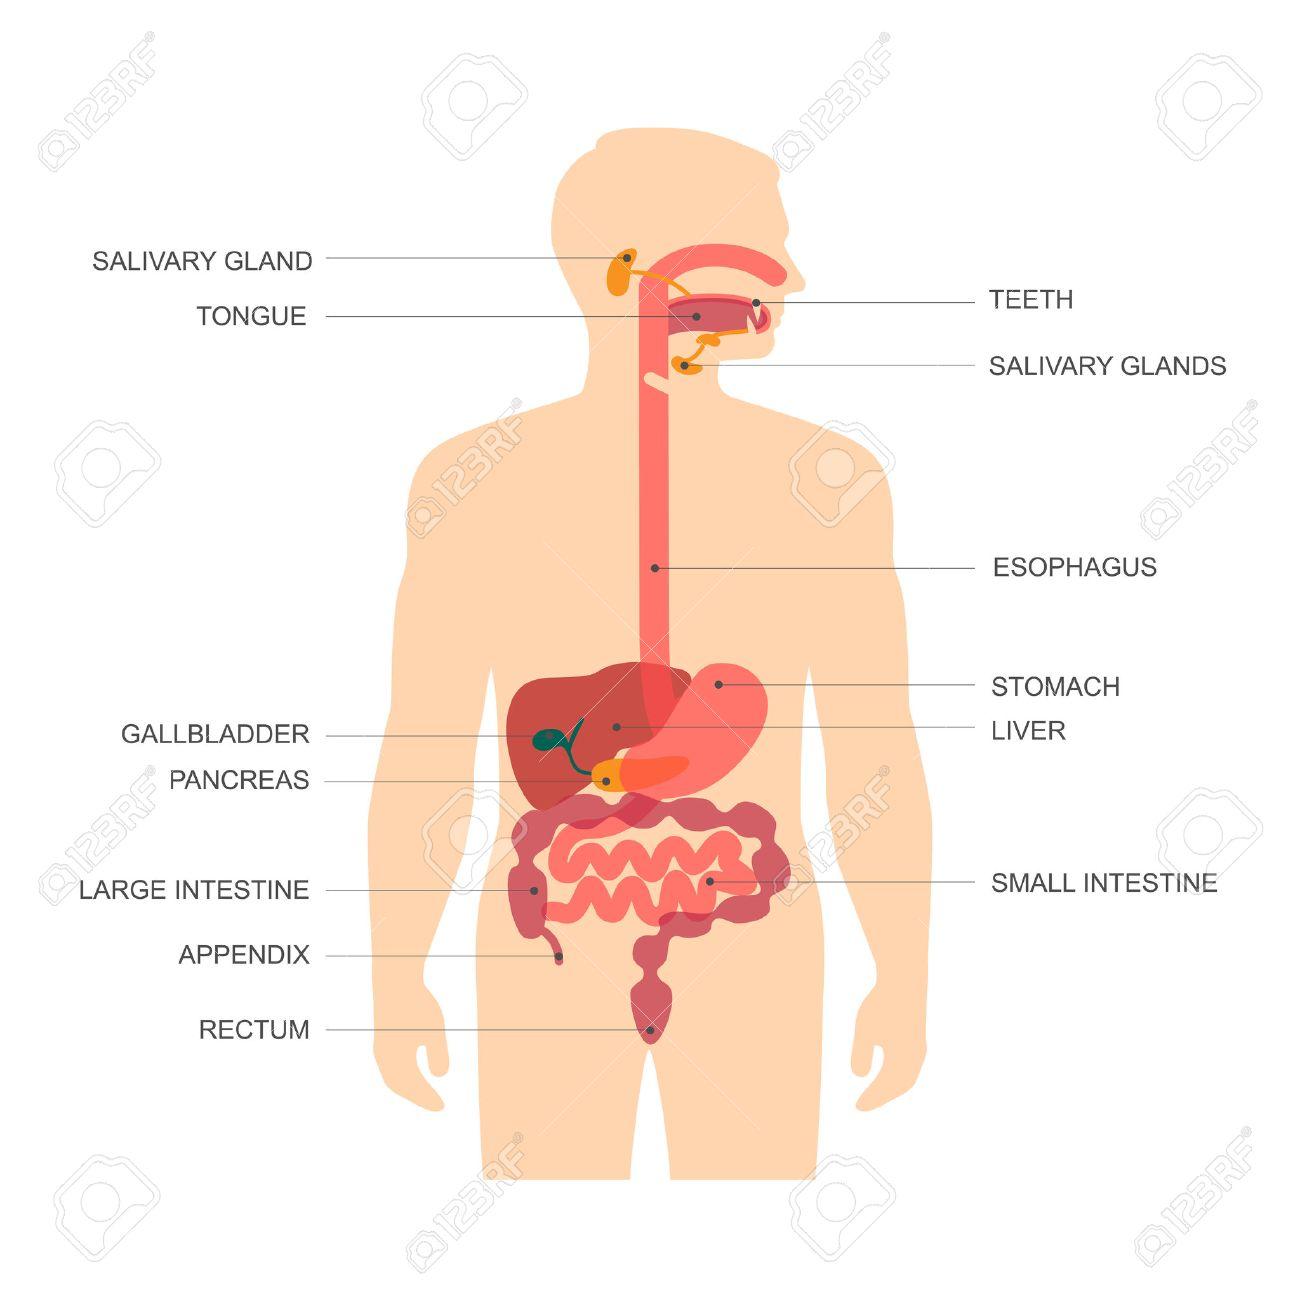 Anatomy Human Digestive System Stomach Vector Illustration Royalty